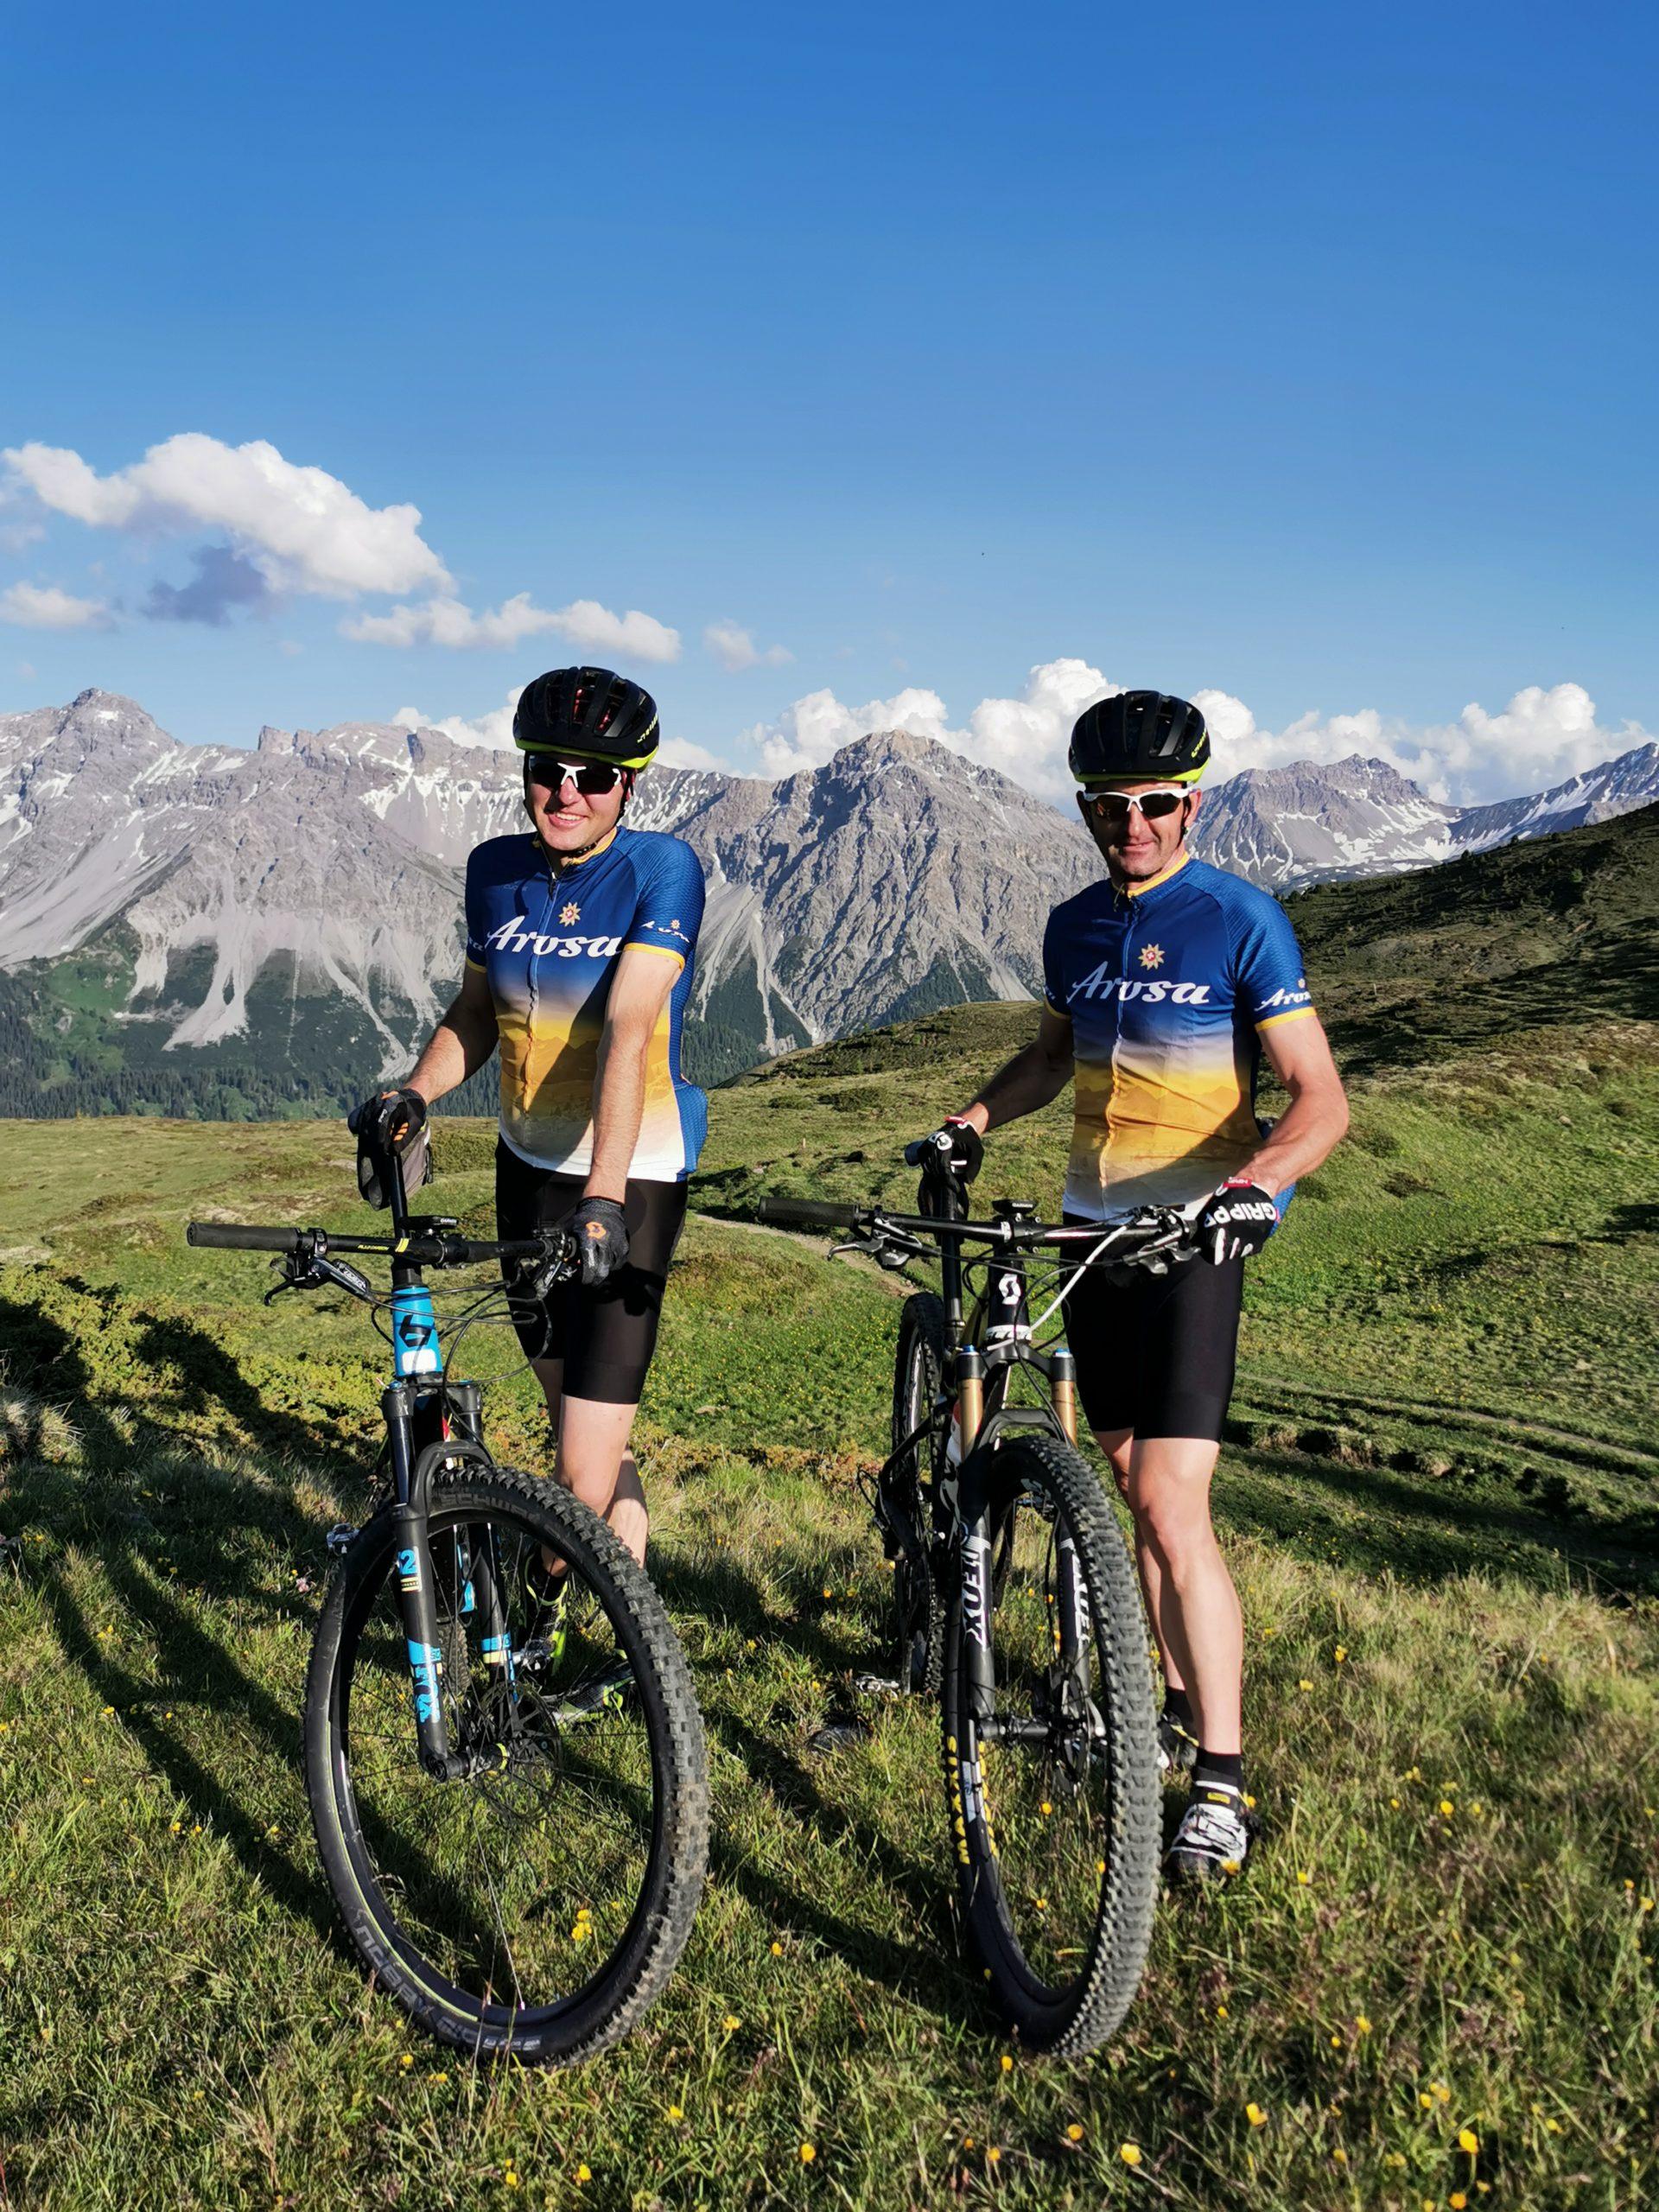 Swiss Epic te gast in Arosa